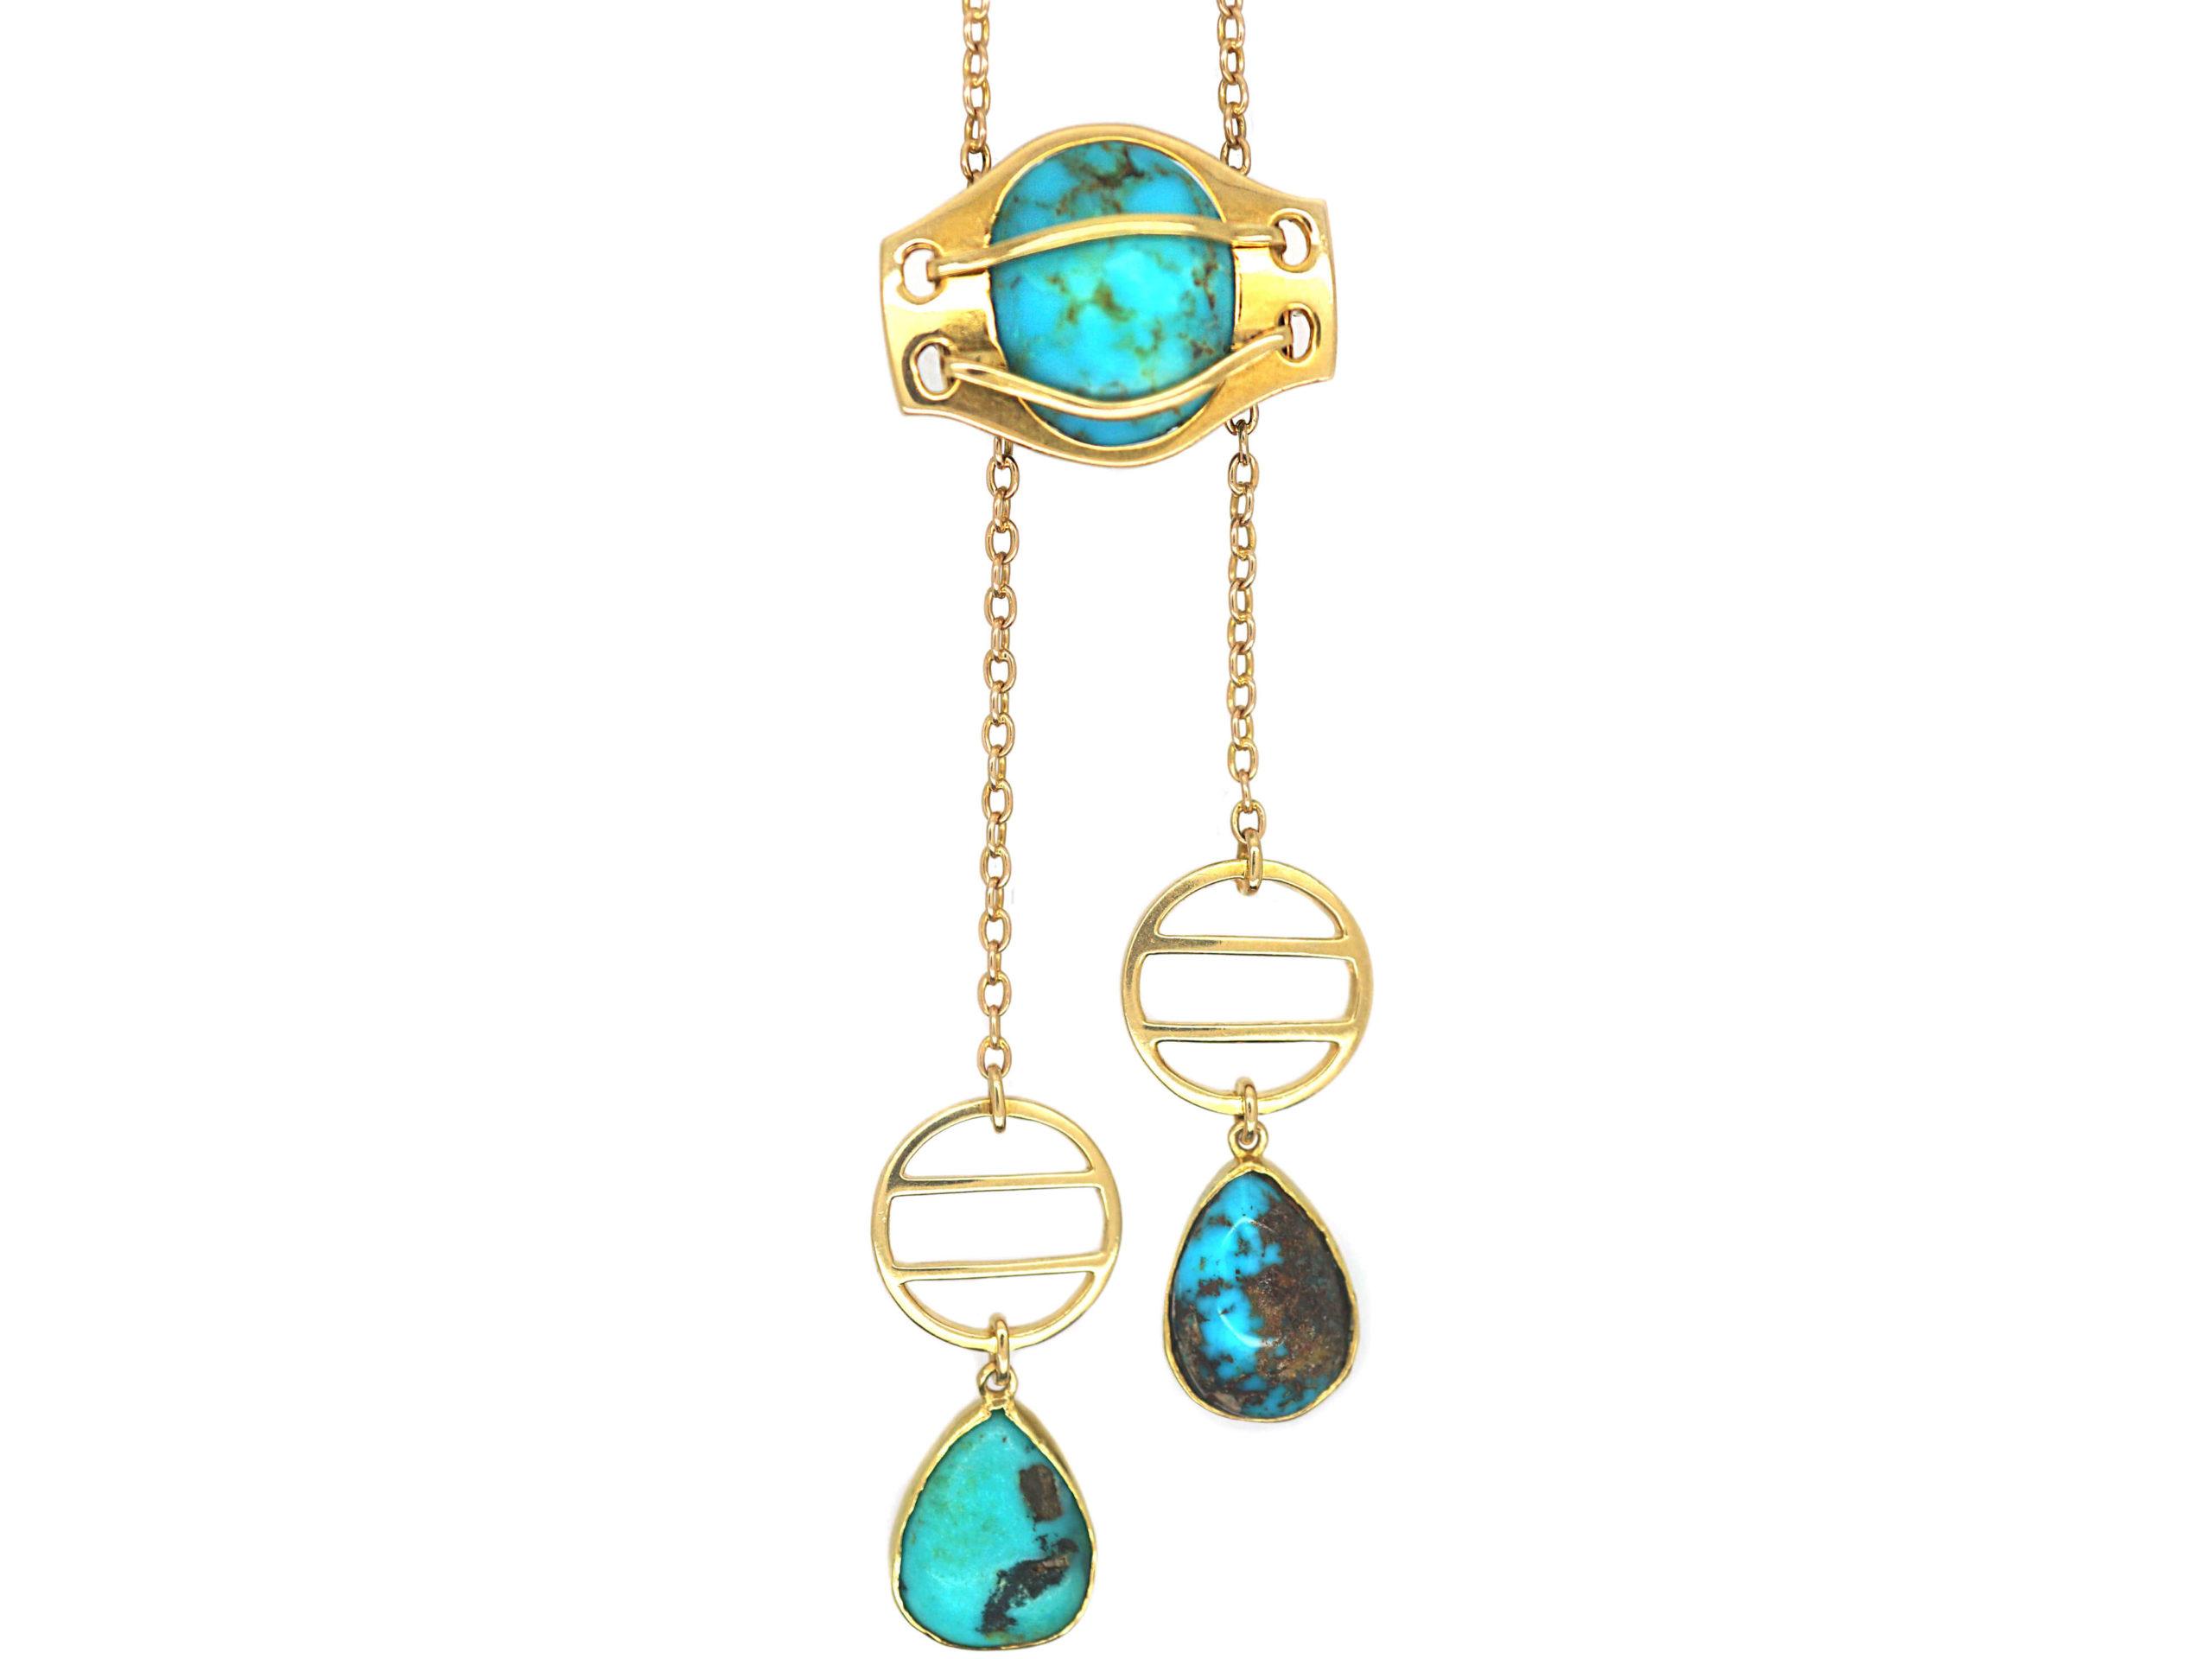 Art Nouveau 15ct Gold & Turquoise Necklace by Murrle Bennett & Co